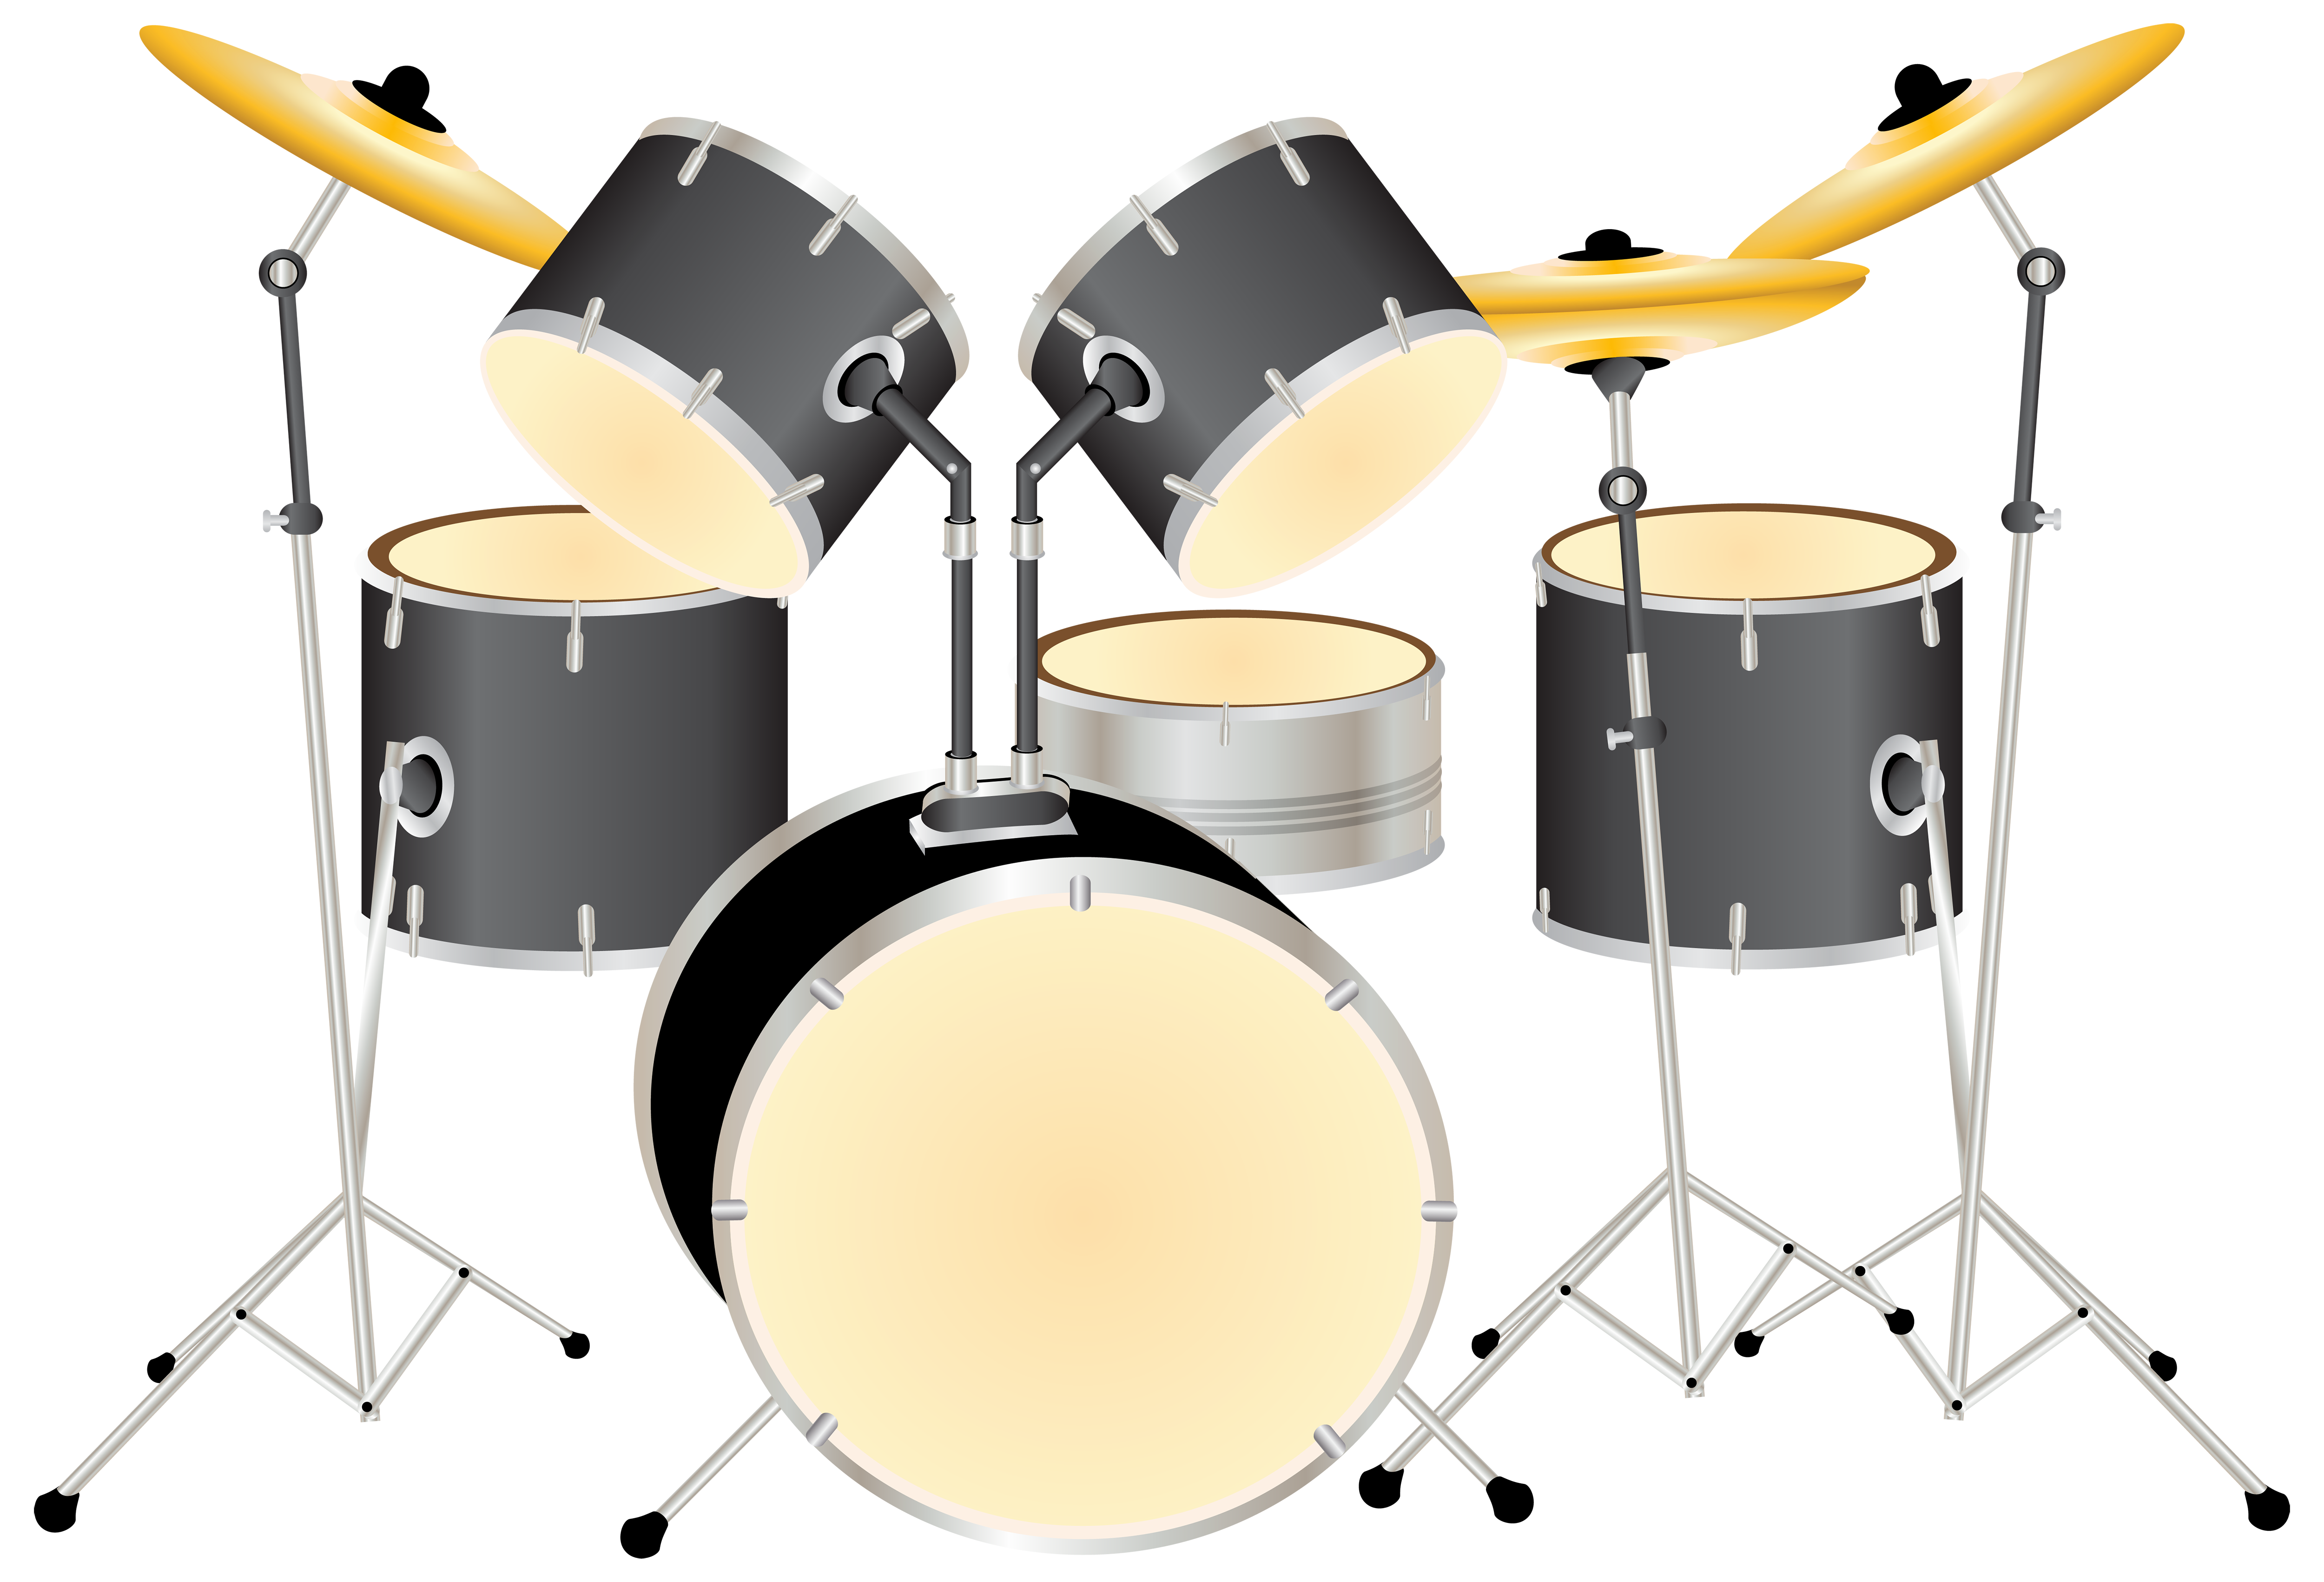 free Drums clipart. Drum kit png best